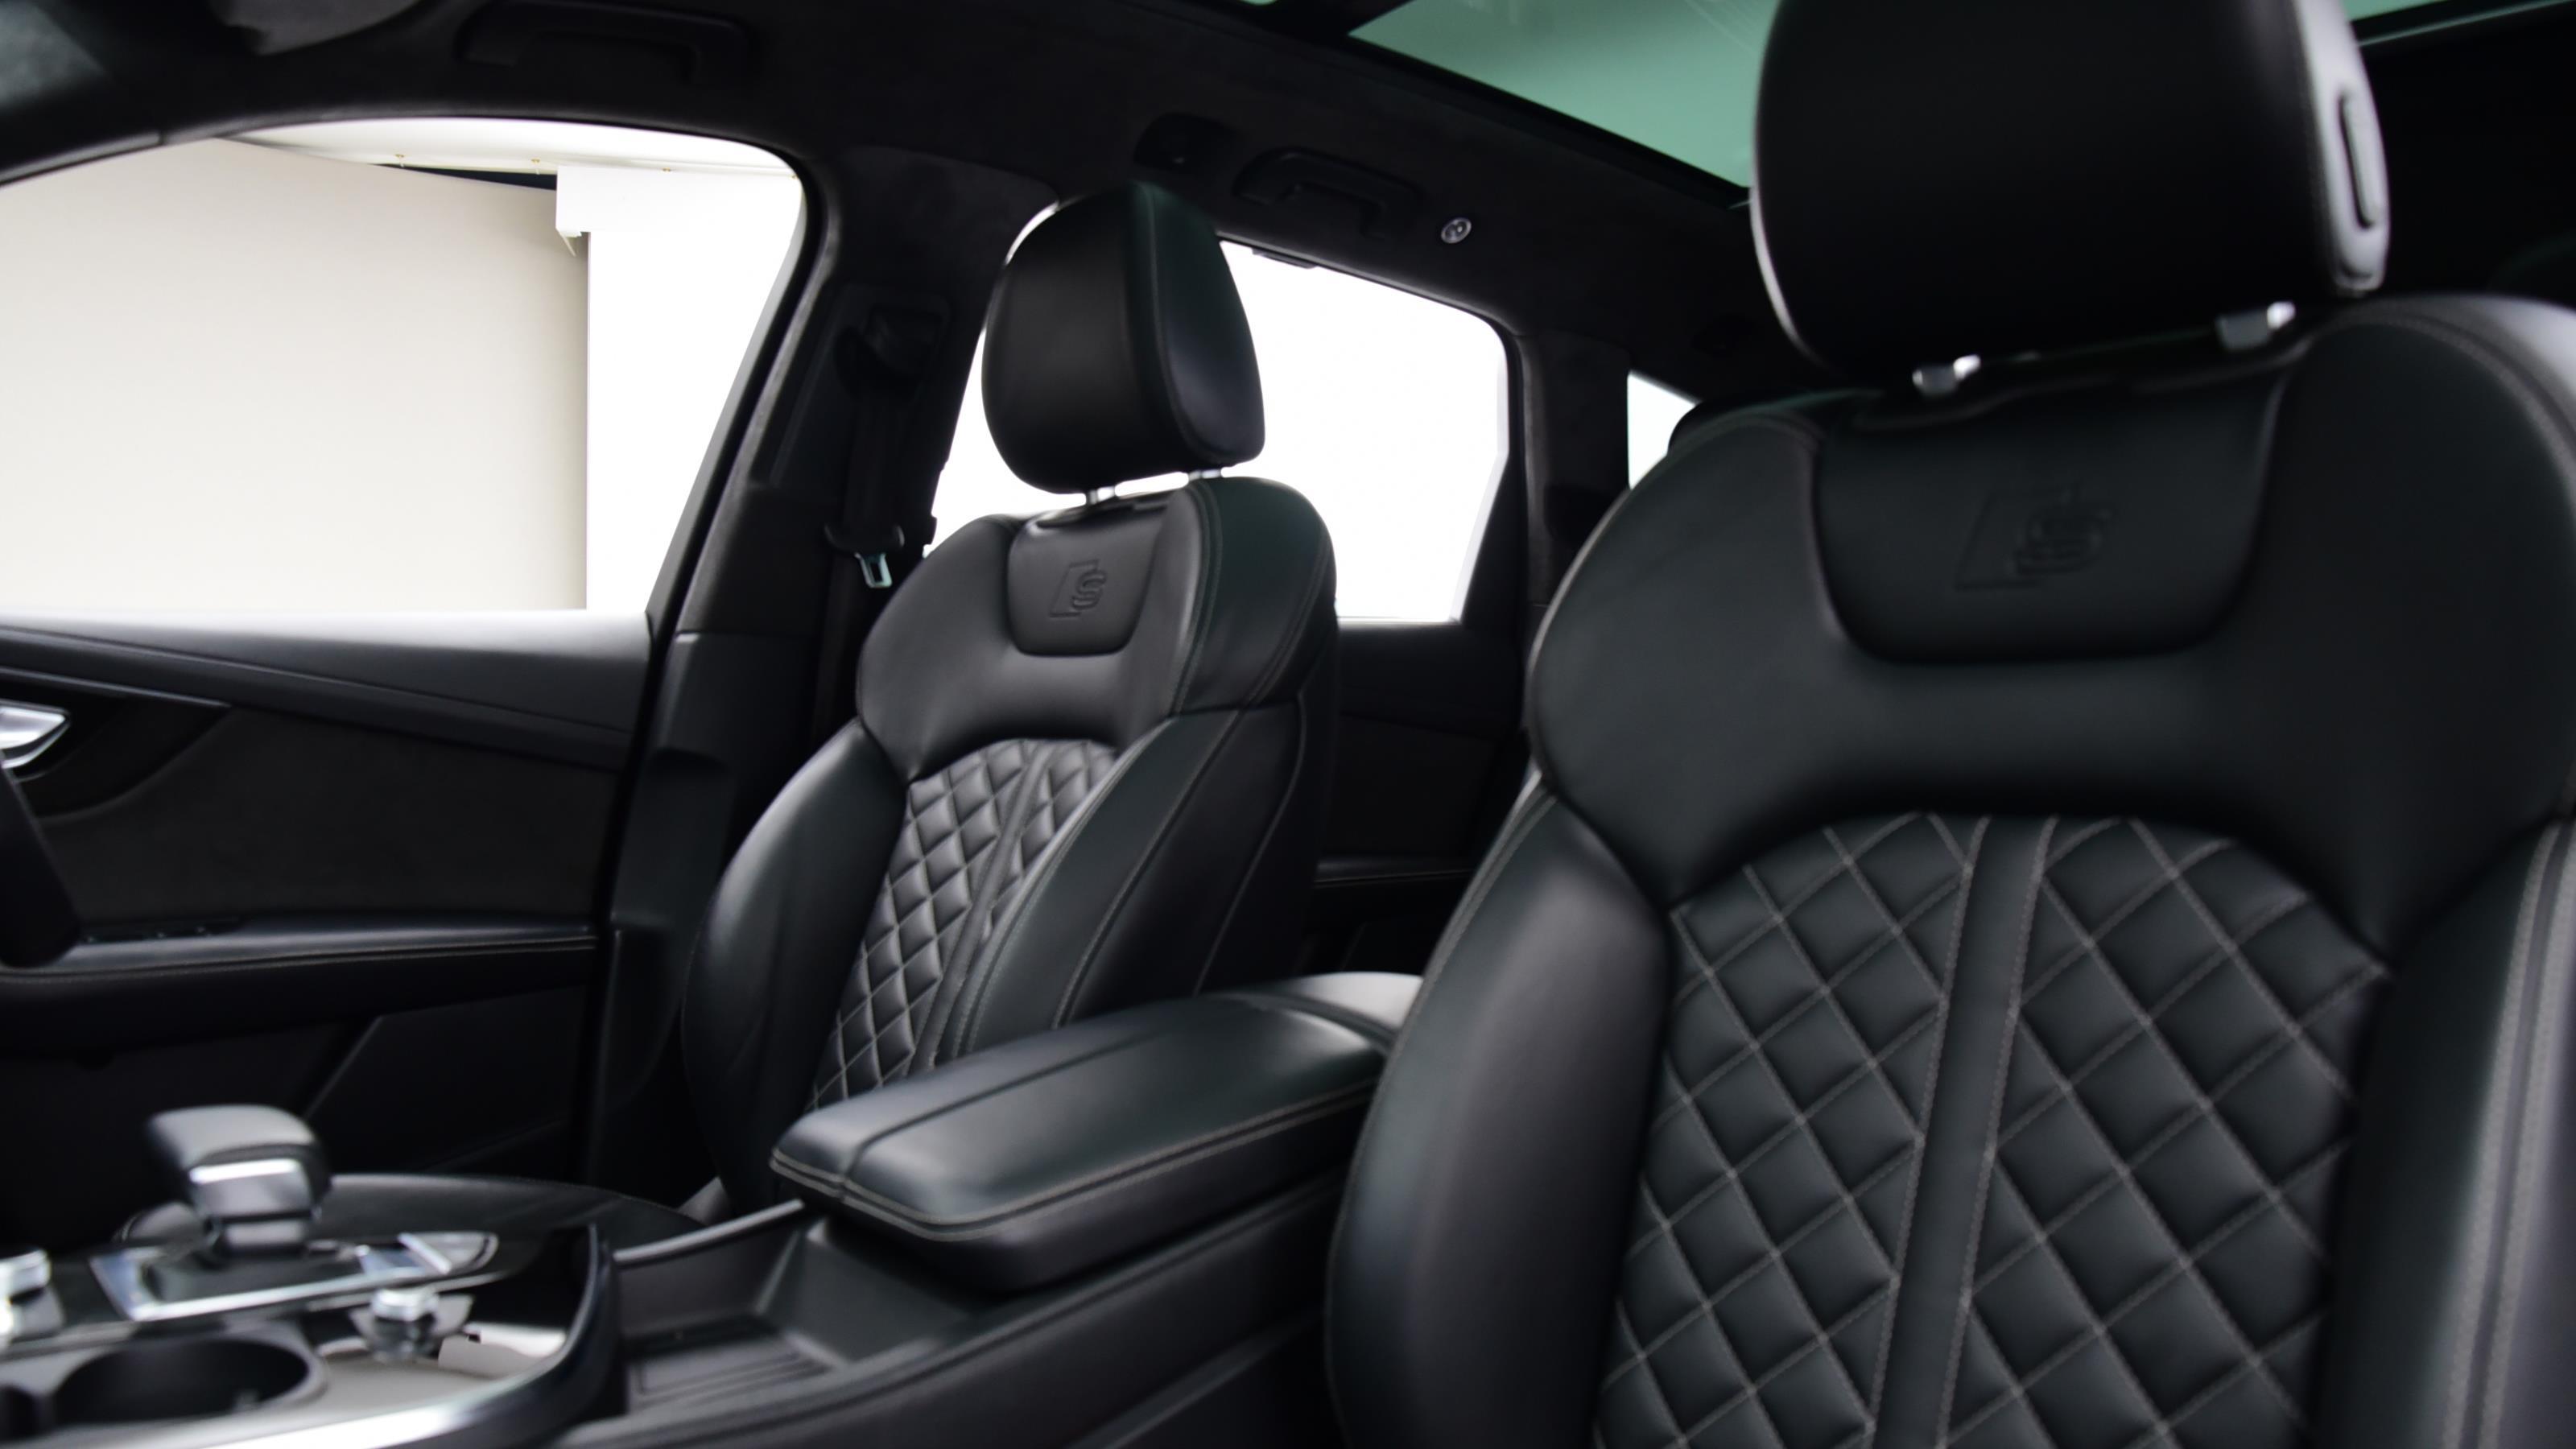 Used 2018 Audi Q7 50 TDI Quattro Vorsprung 5dr Tiptronic BLACK at Saxton4x4